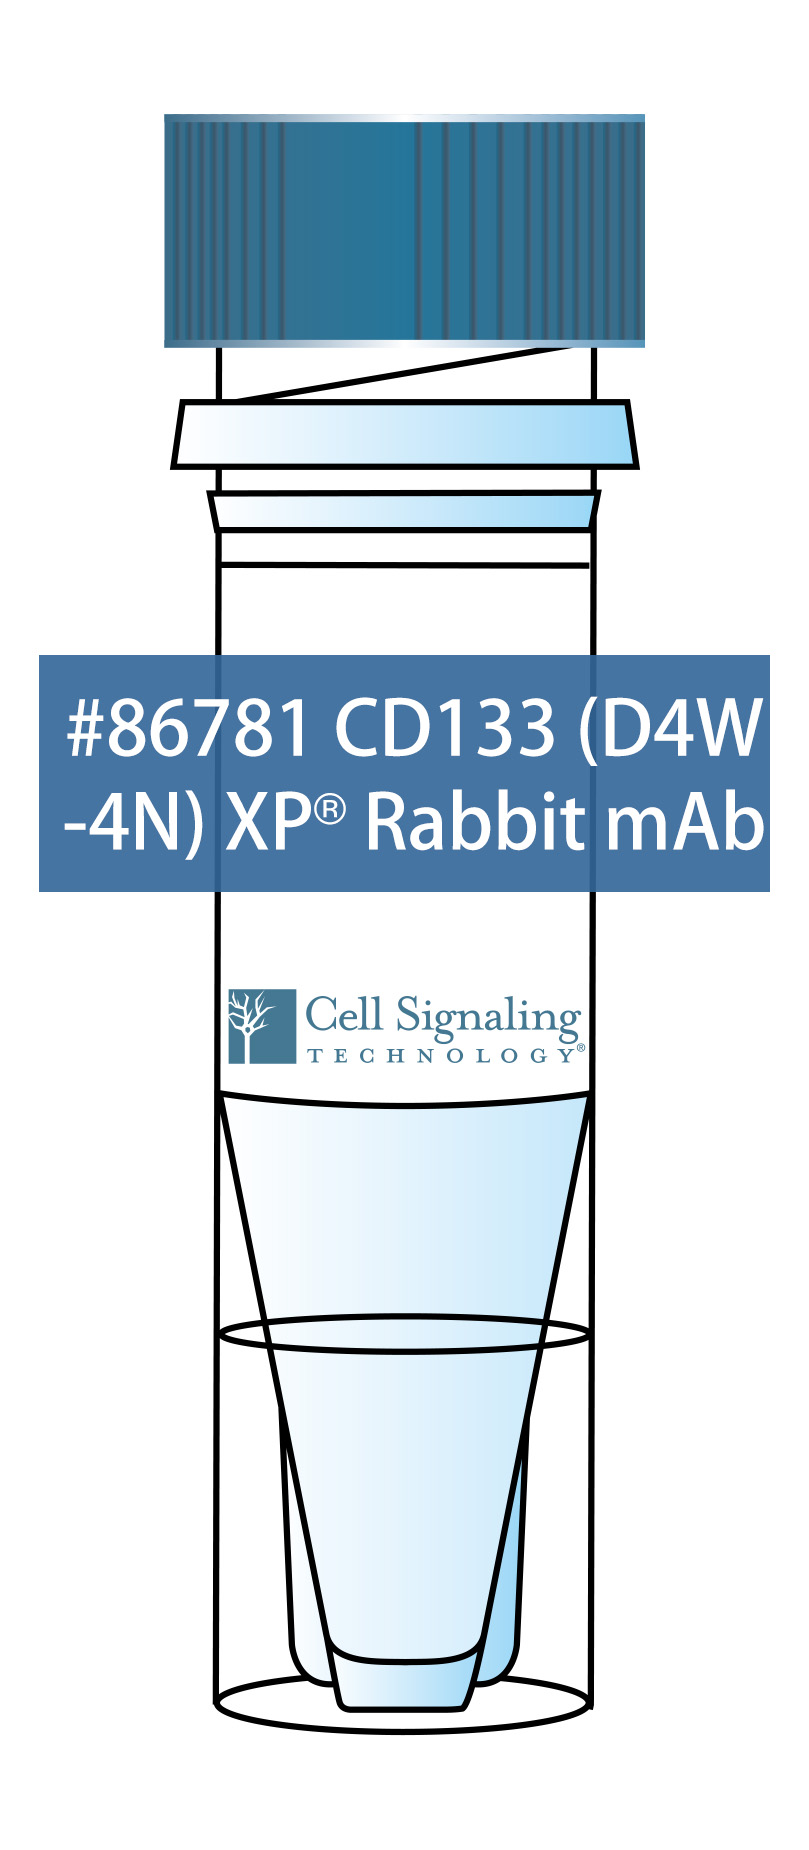 CD133 (D4W4N) XP®️ Rabbit mAb